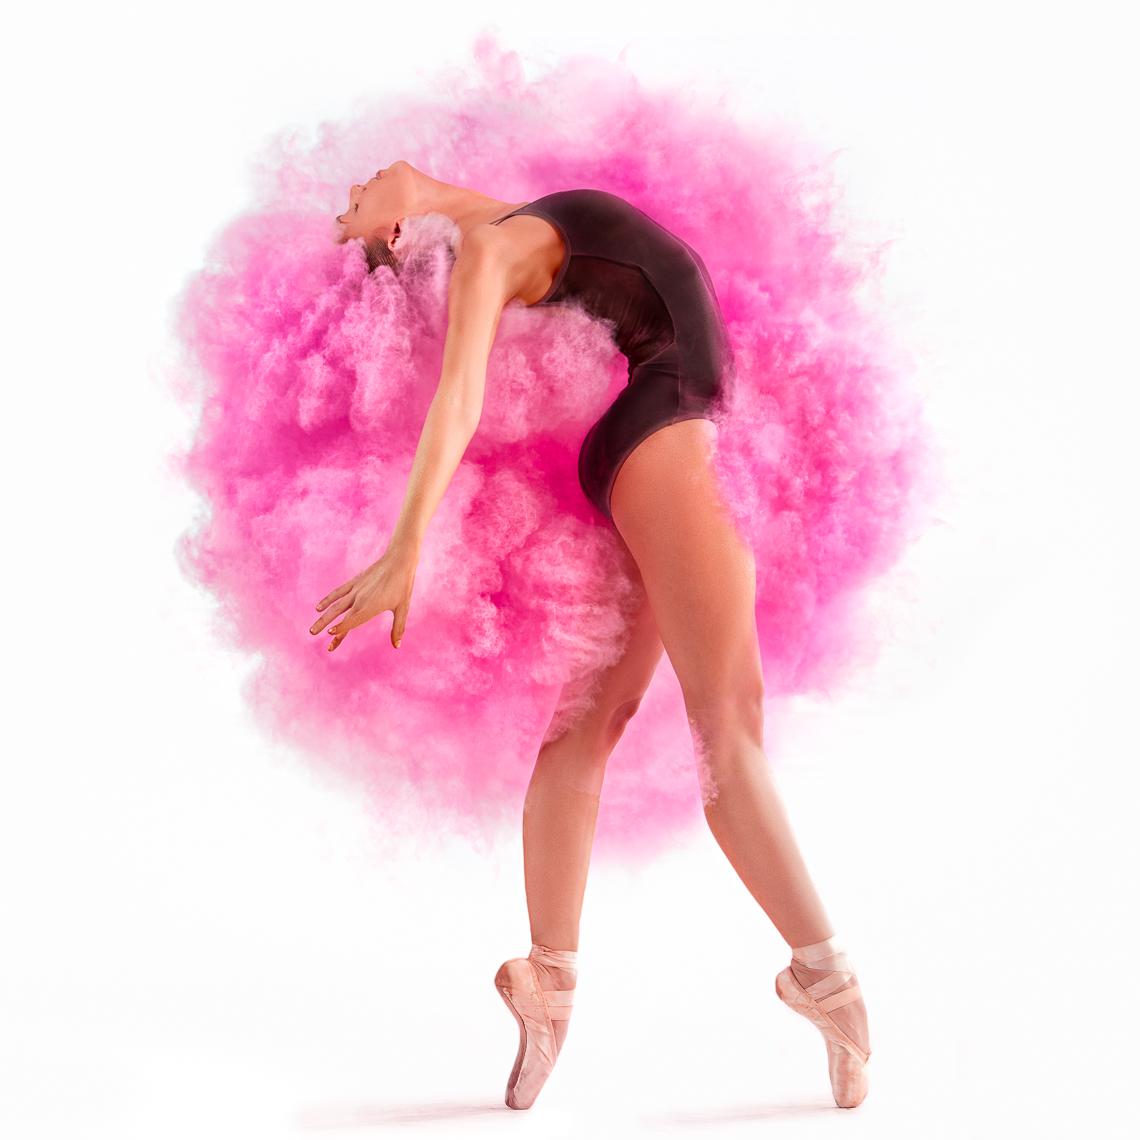 pink_cloud_ballet_glow_final